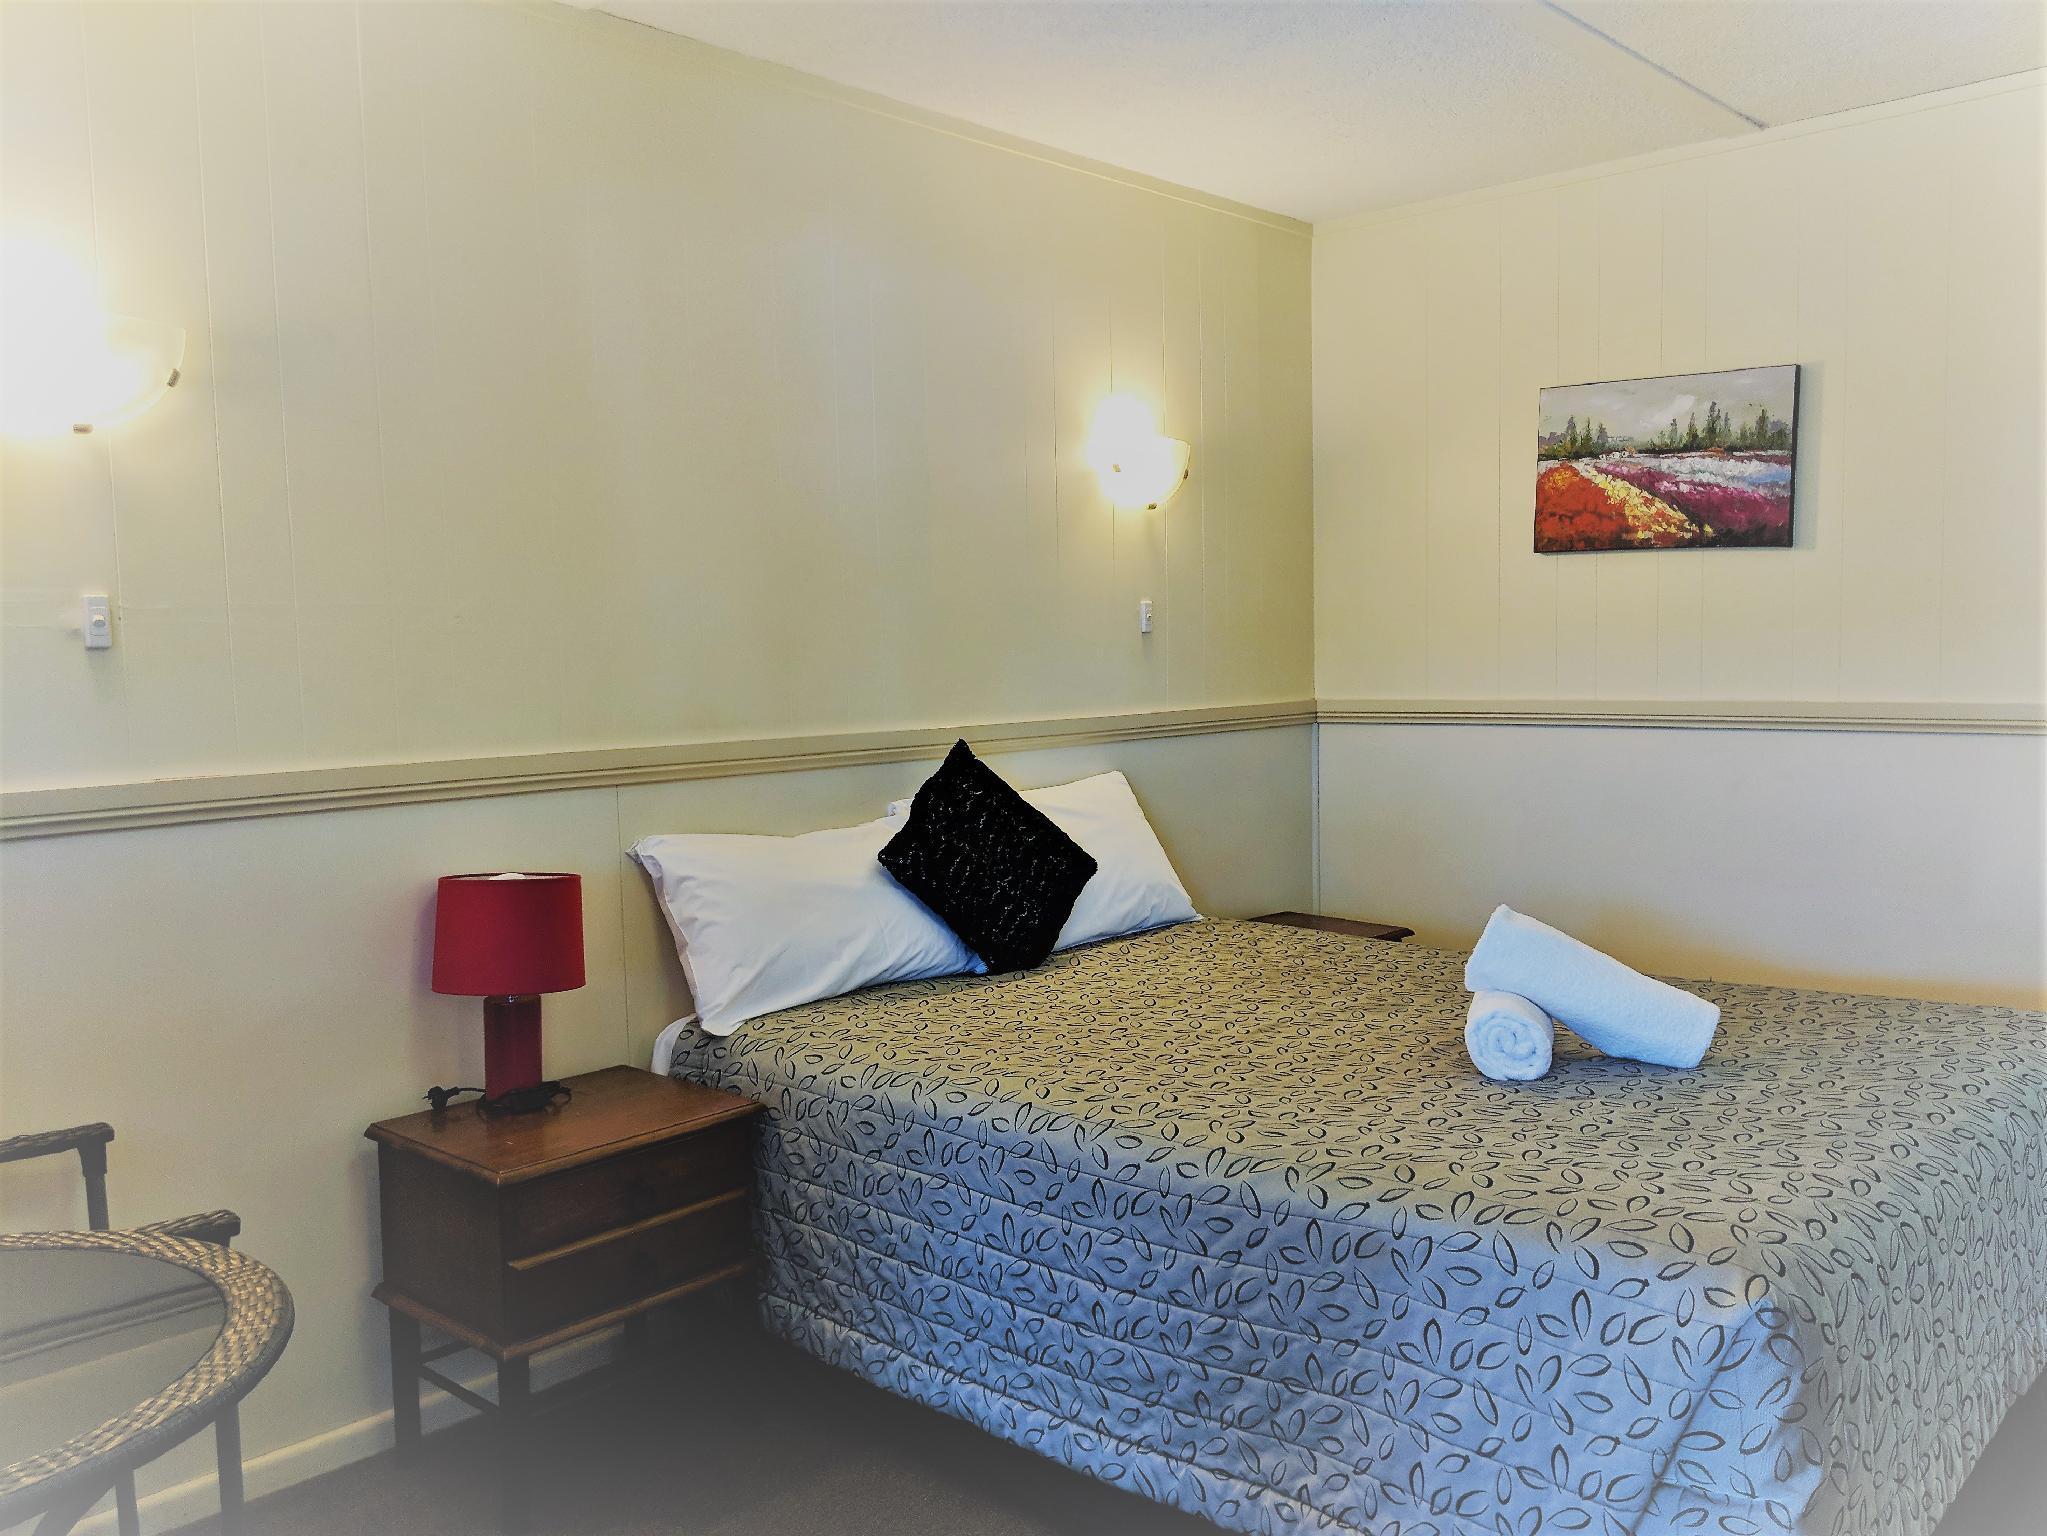 Miners Lodge Motor Inn, Mackay - Pt A